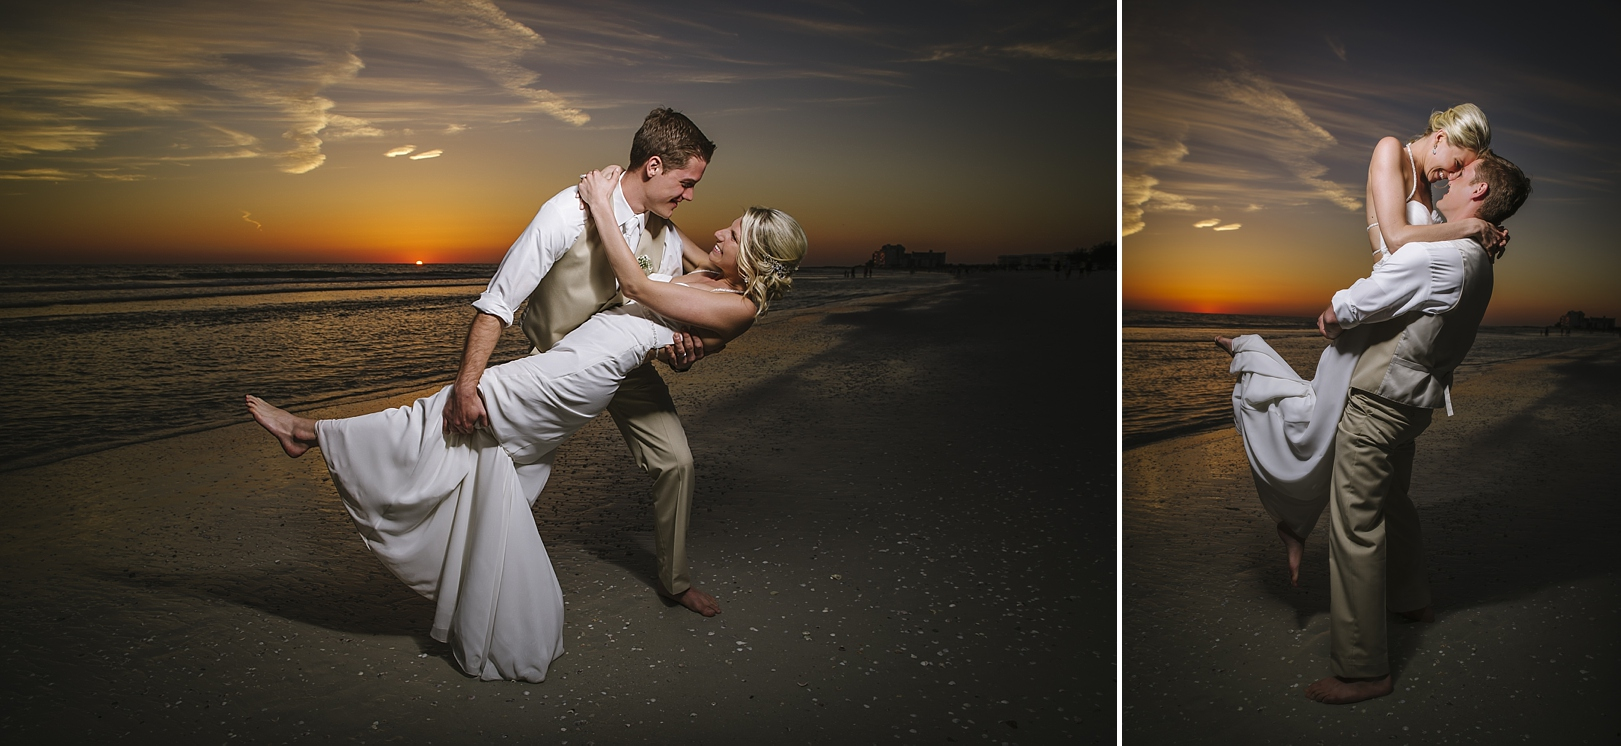 romantic sunset sirata beach wedding photos